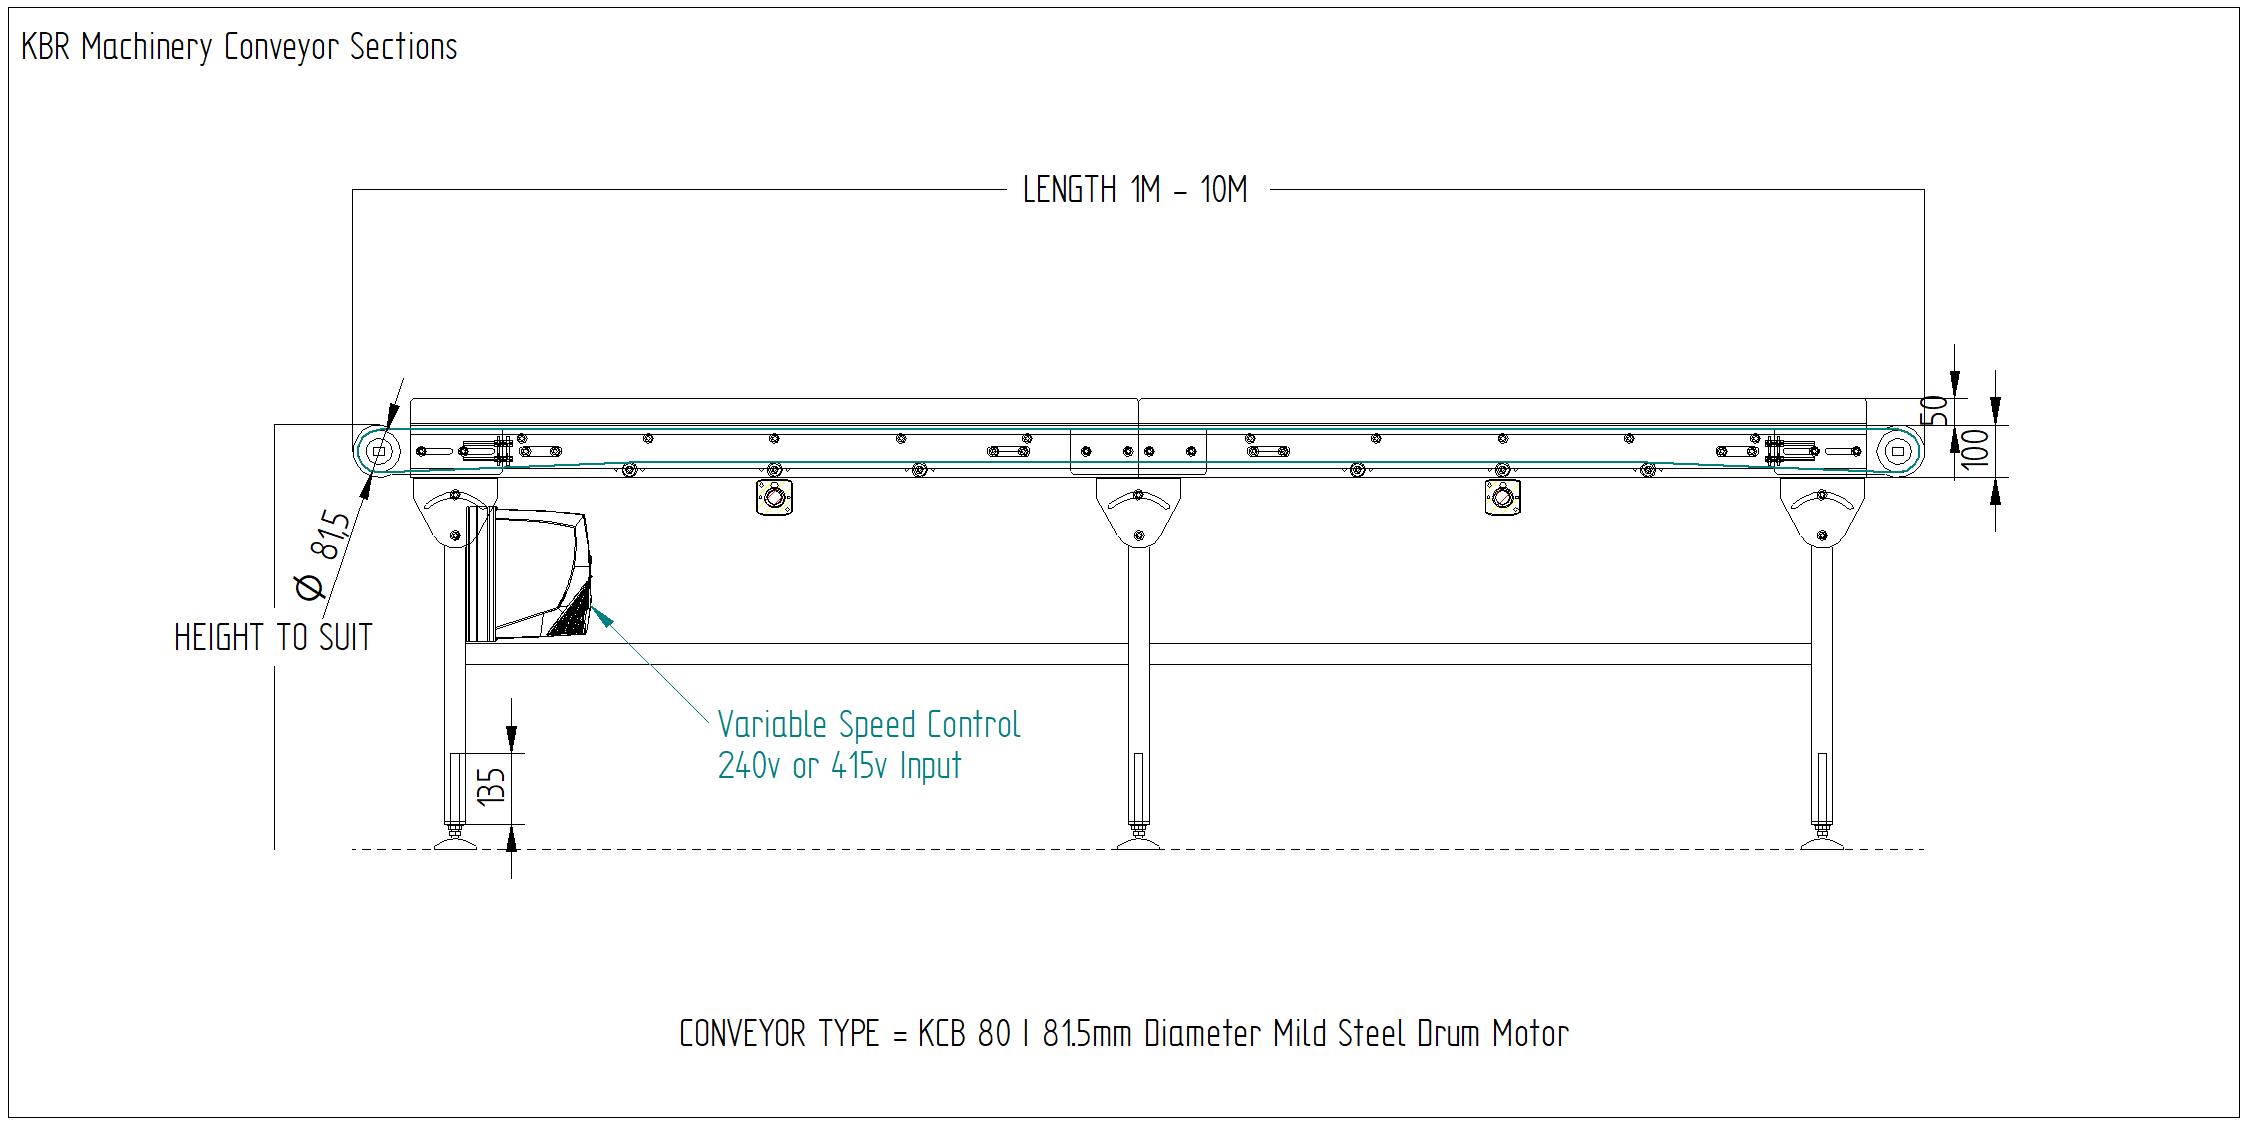 Light Duty Belt Conveyors & Conveyor Belt Systems - KCB 80